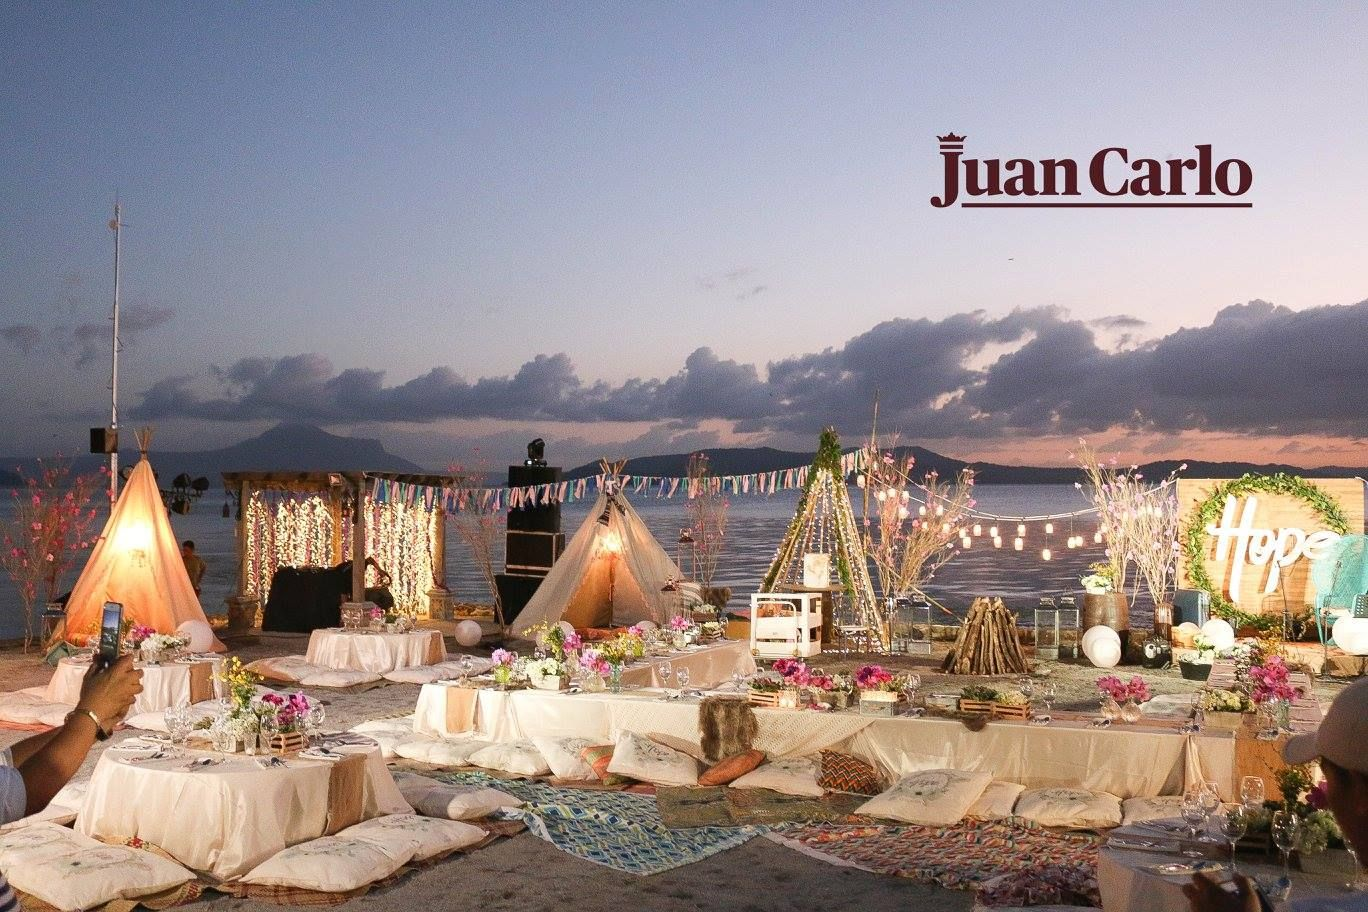 Juan Carlo S Bohemian Inspire At Liza Soberano S Debut Debutbyjuancarlo Juancarloinspired Coachella Theme Party Debut Party Coachella Party